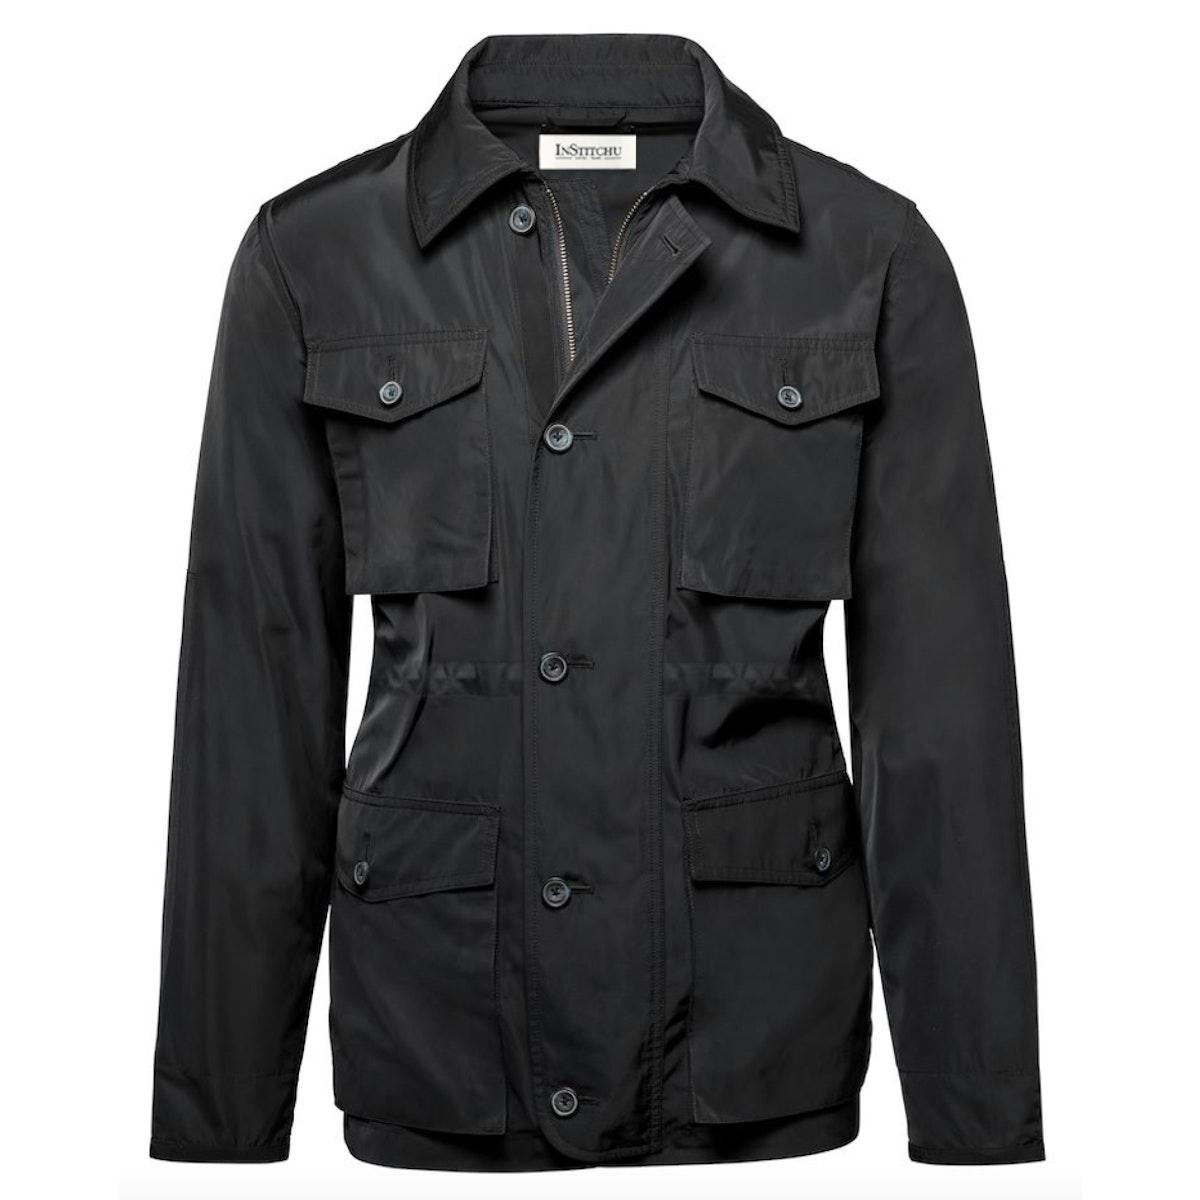 The Hunt Black Field Jacket